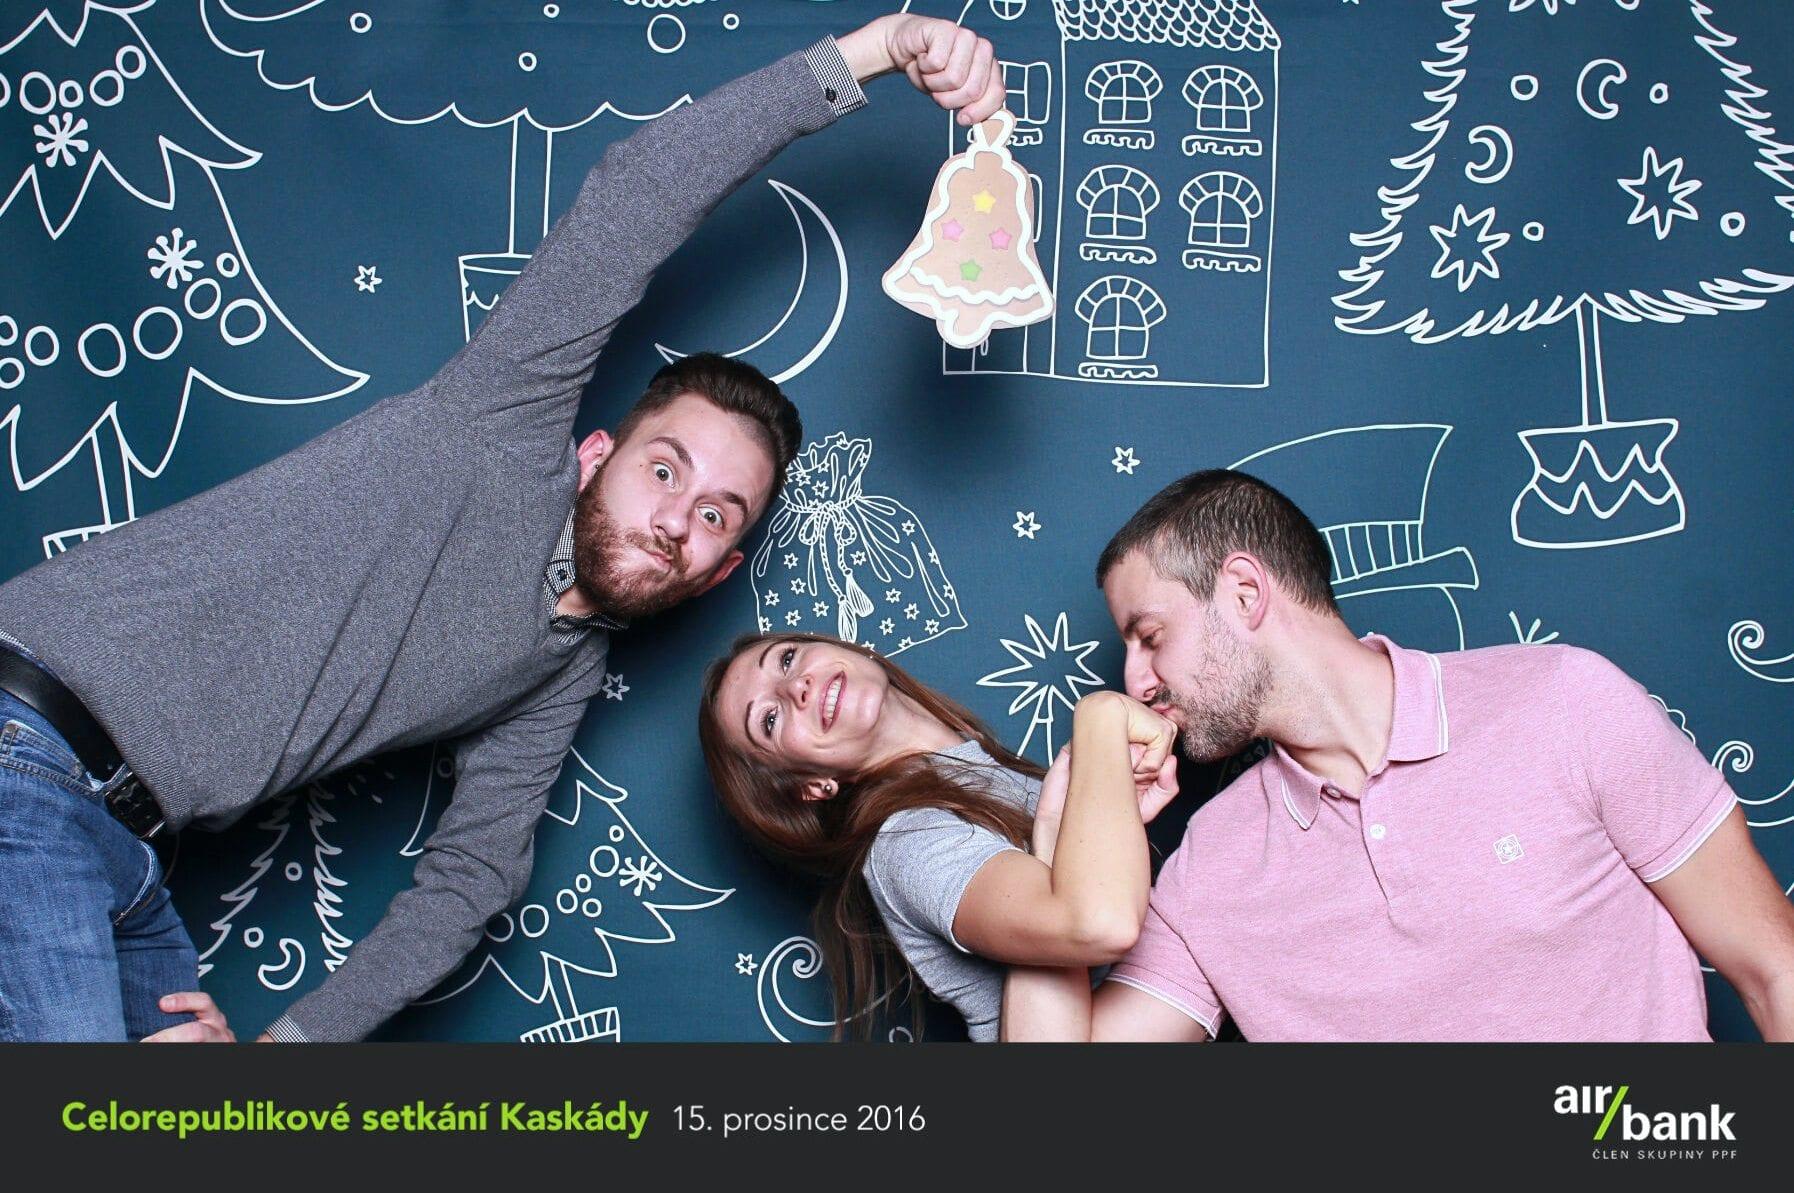 fotokoutek-air-bank-15-12-2016-189678